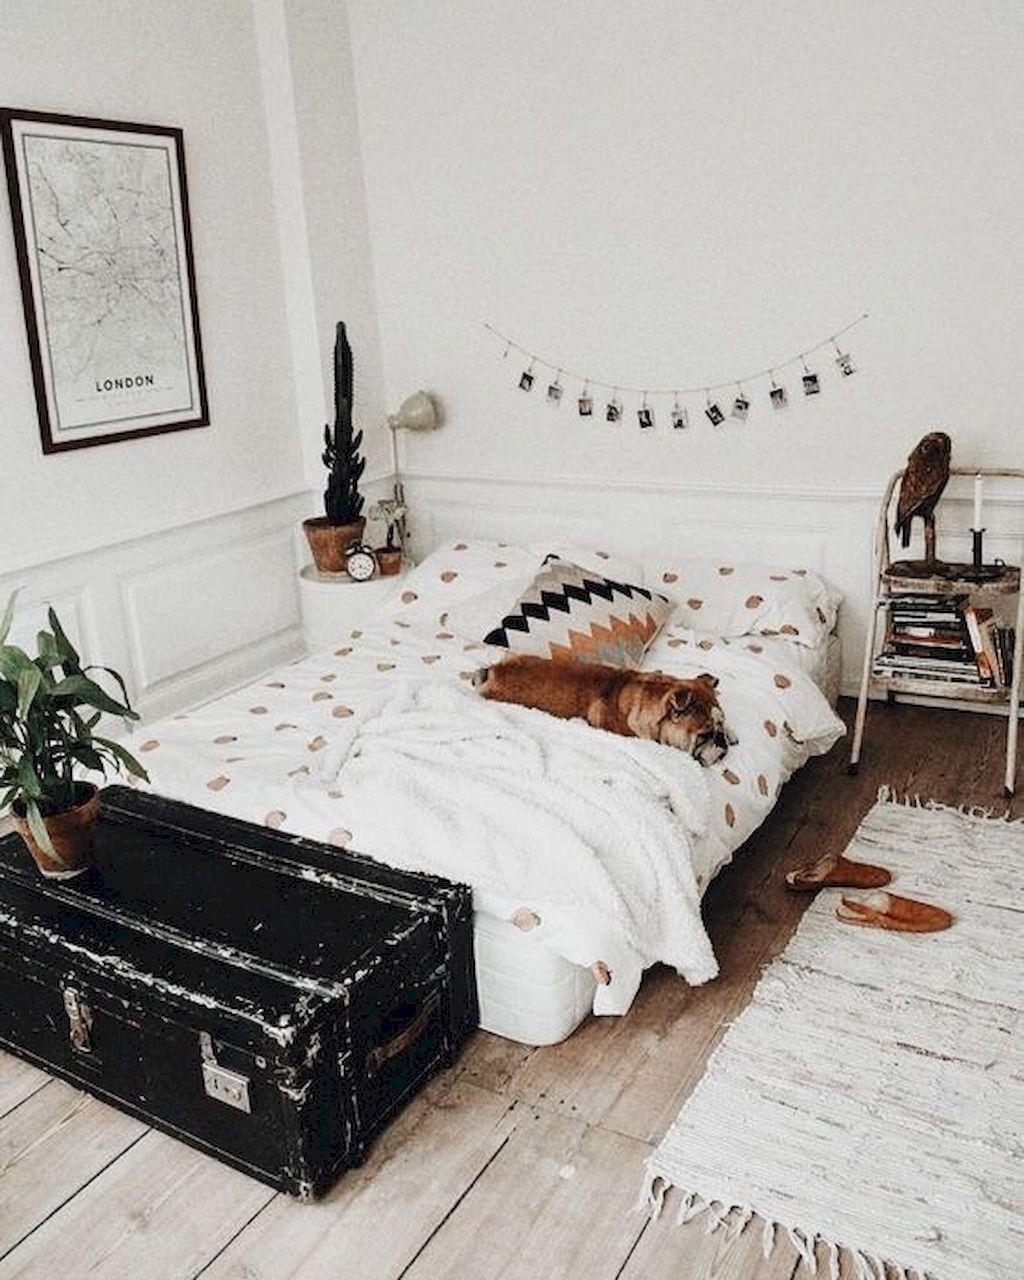 Bohemian Style Bedroom Decoration Ideas Home To Z Room Inspiration Home Decor Bedroom Design Vintage minimalist bedroom design